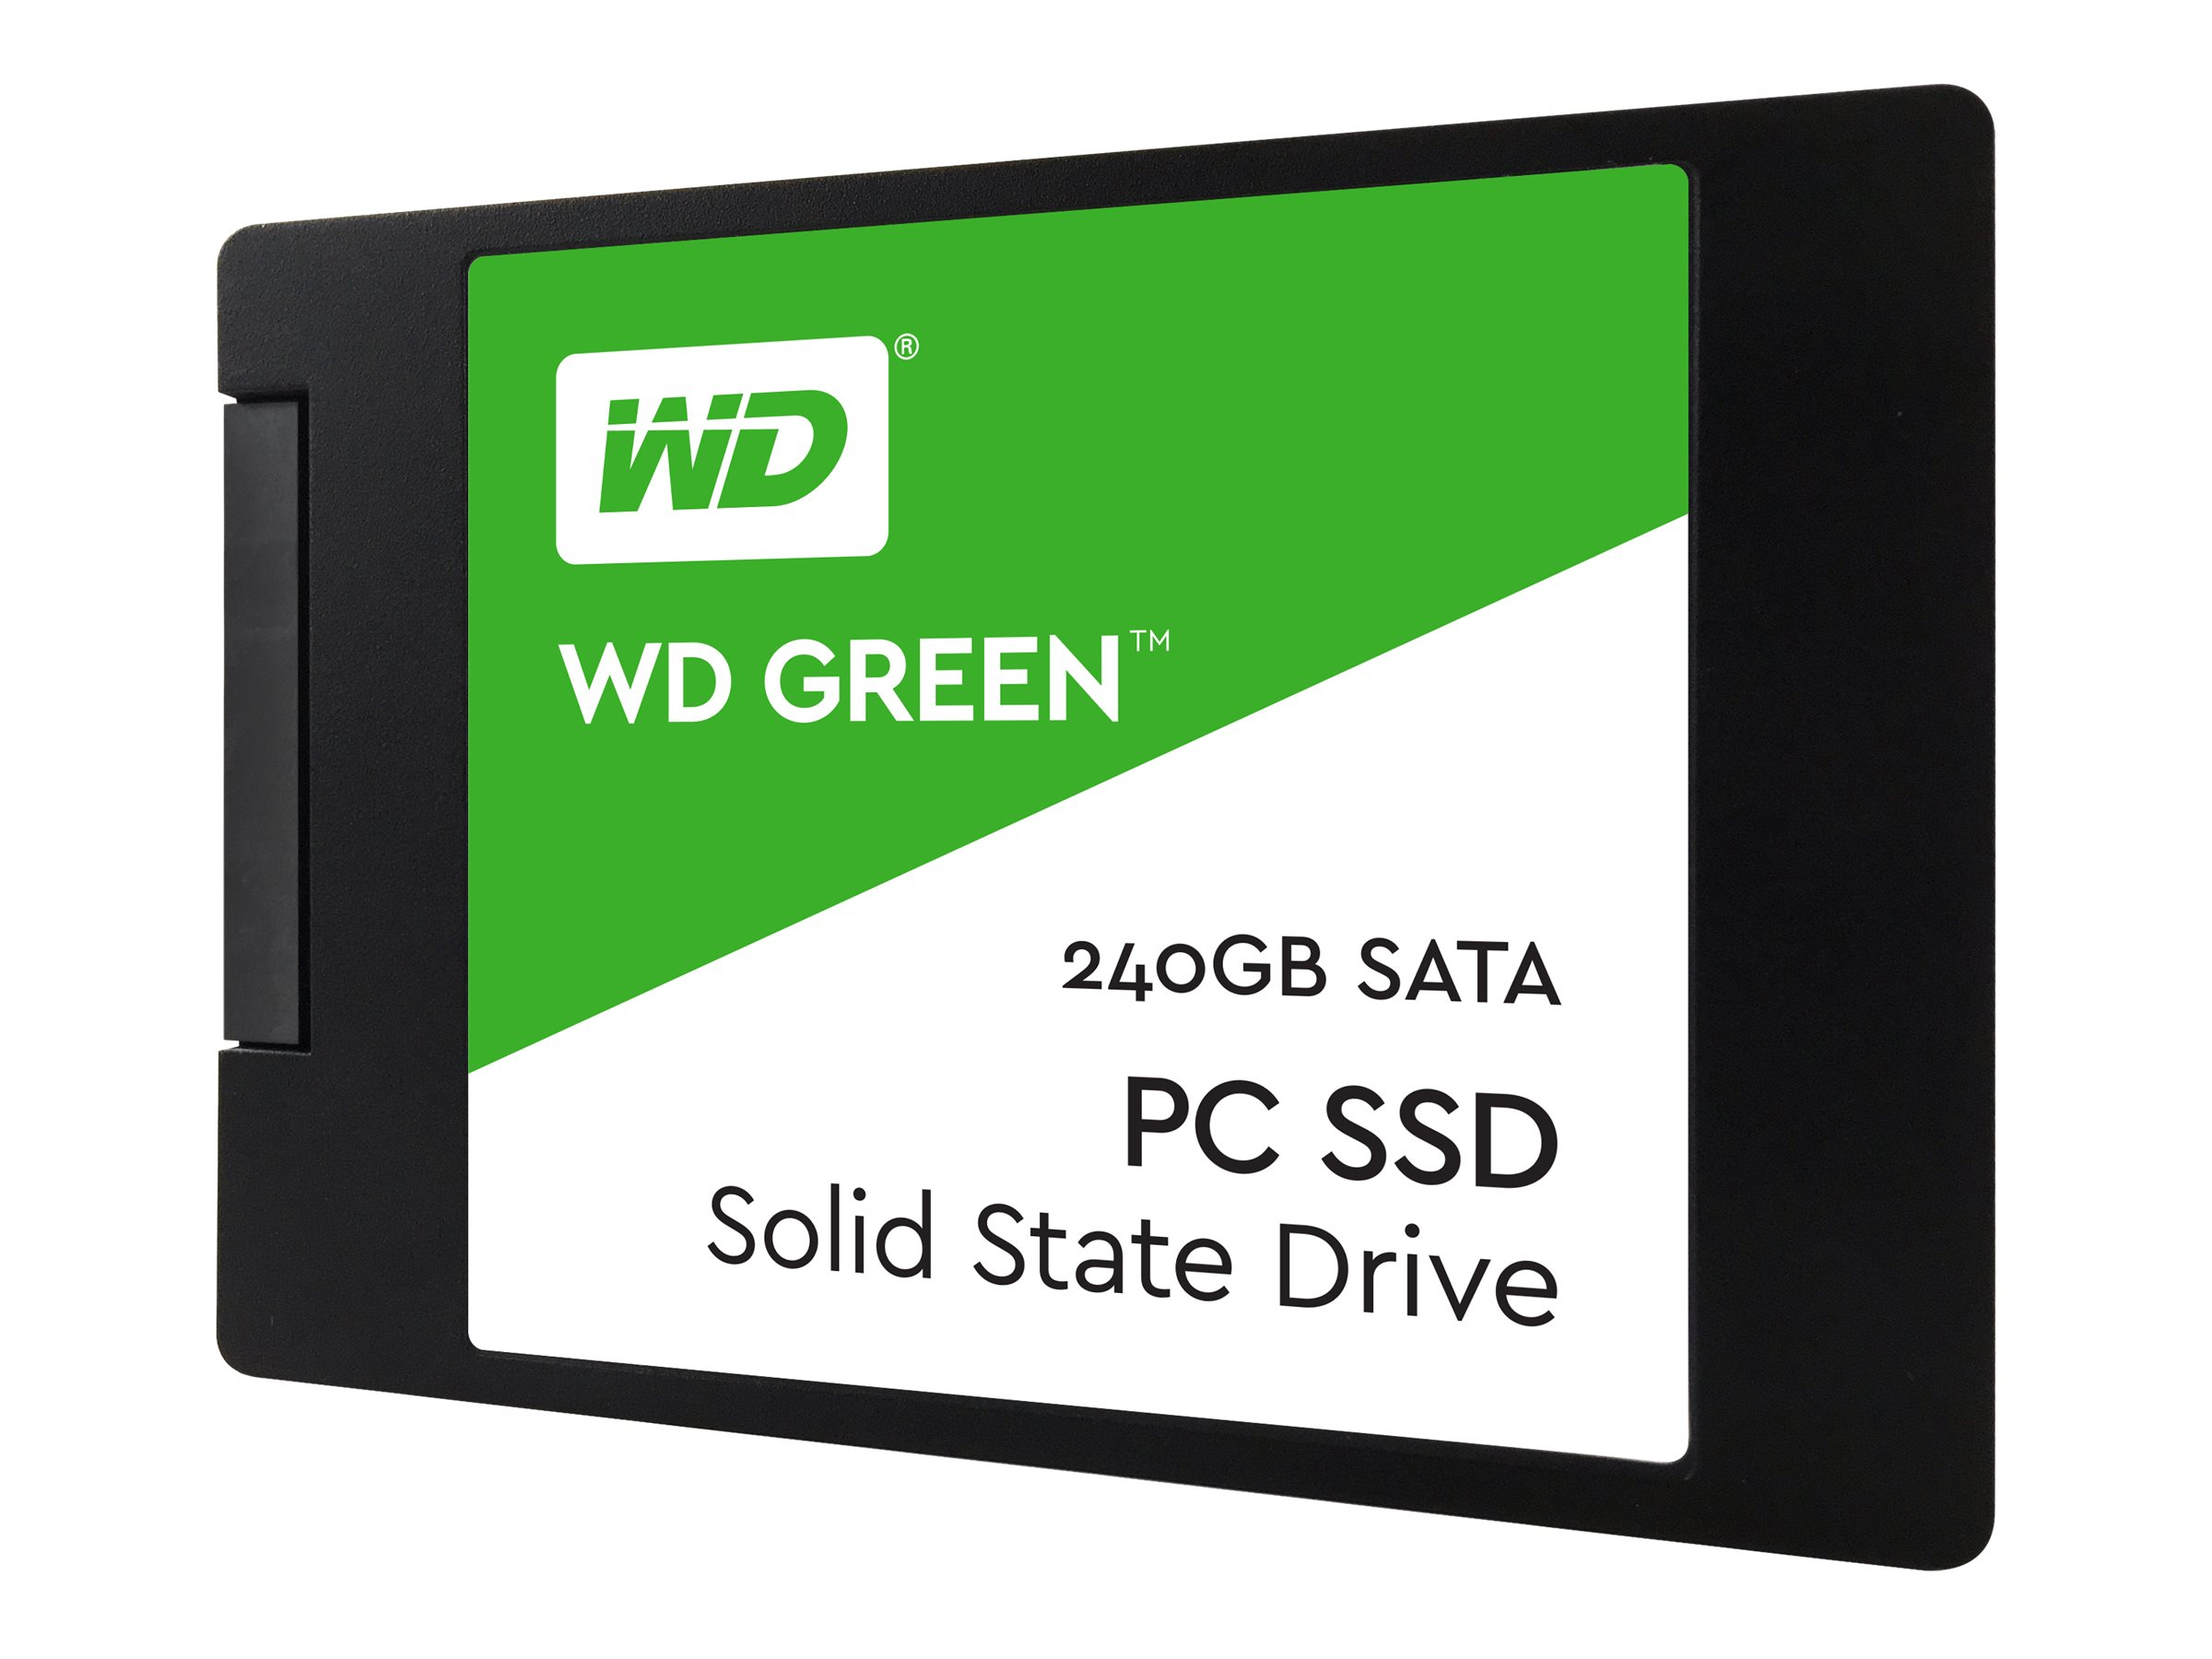 Wd green ssd wds240g2g0a solid state disk 240 gb intern 2 5 6 4 cm sata 6gb s 8264954 wds240g2g0a